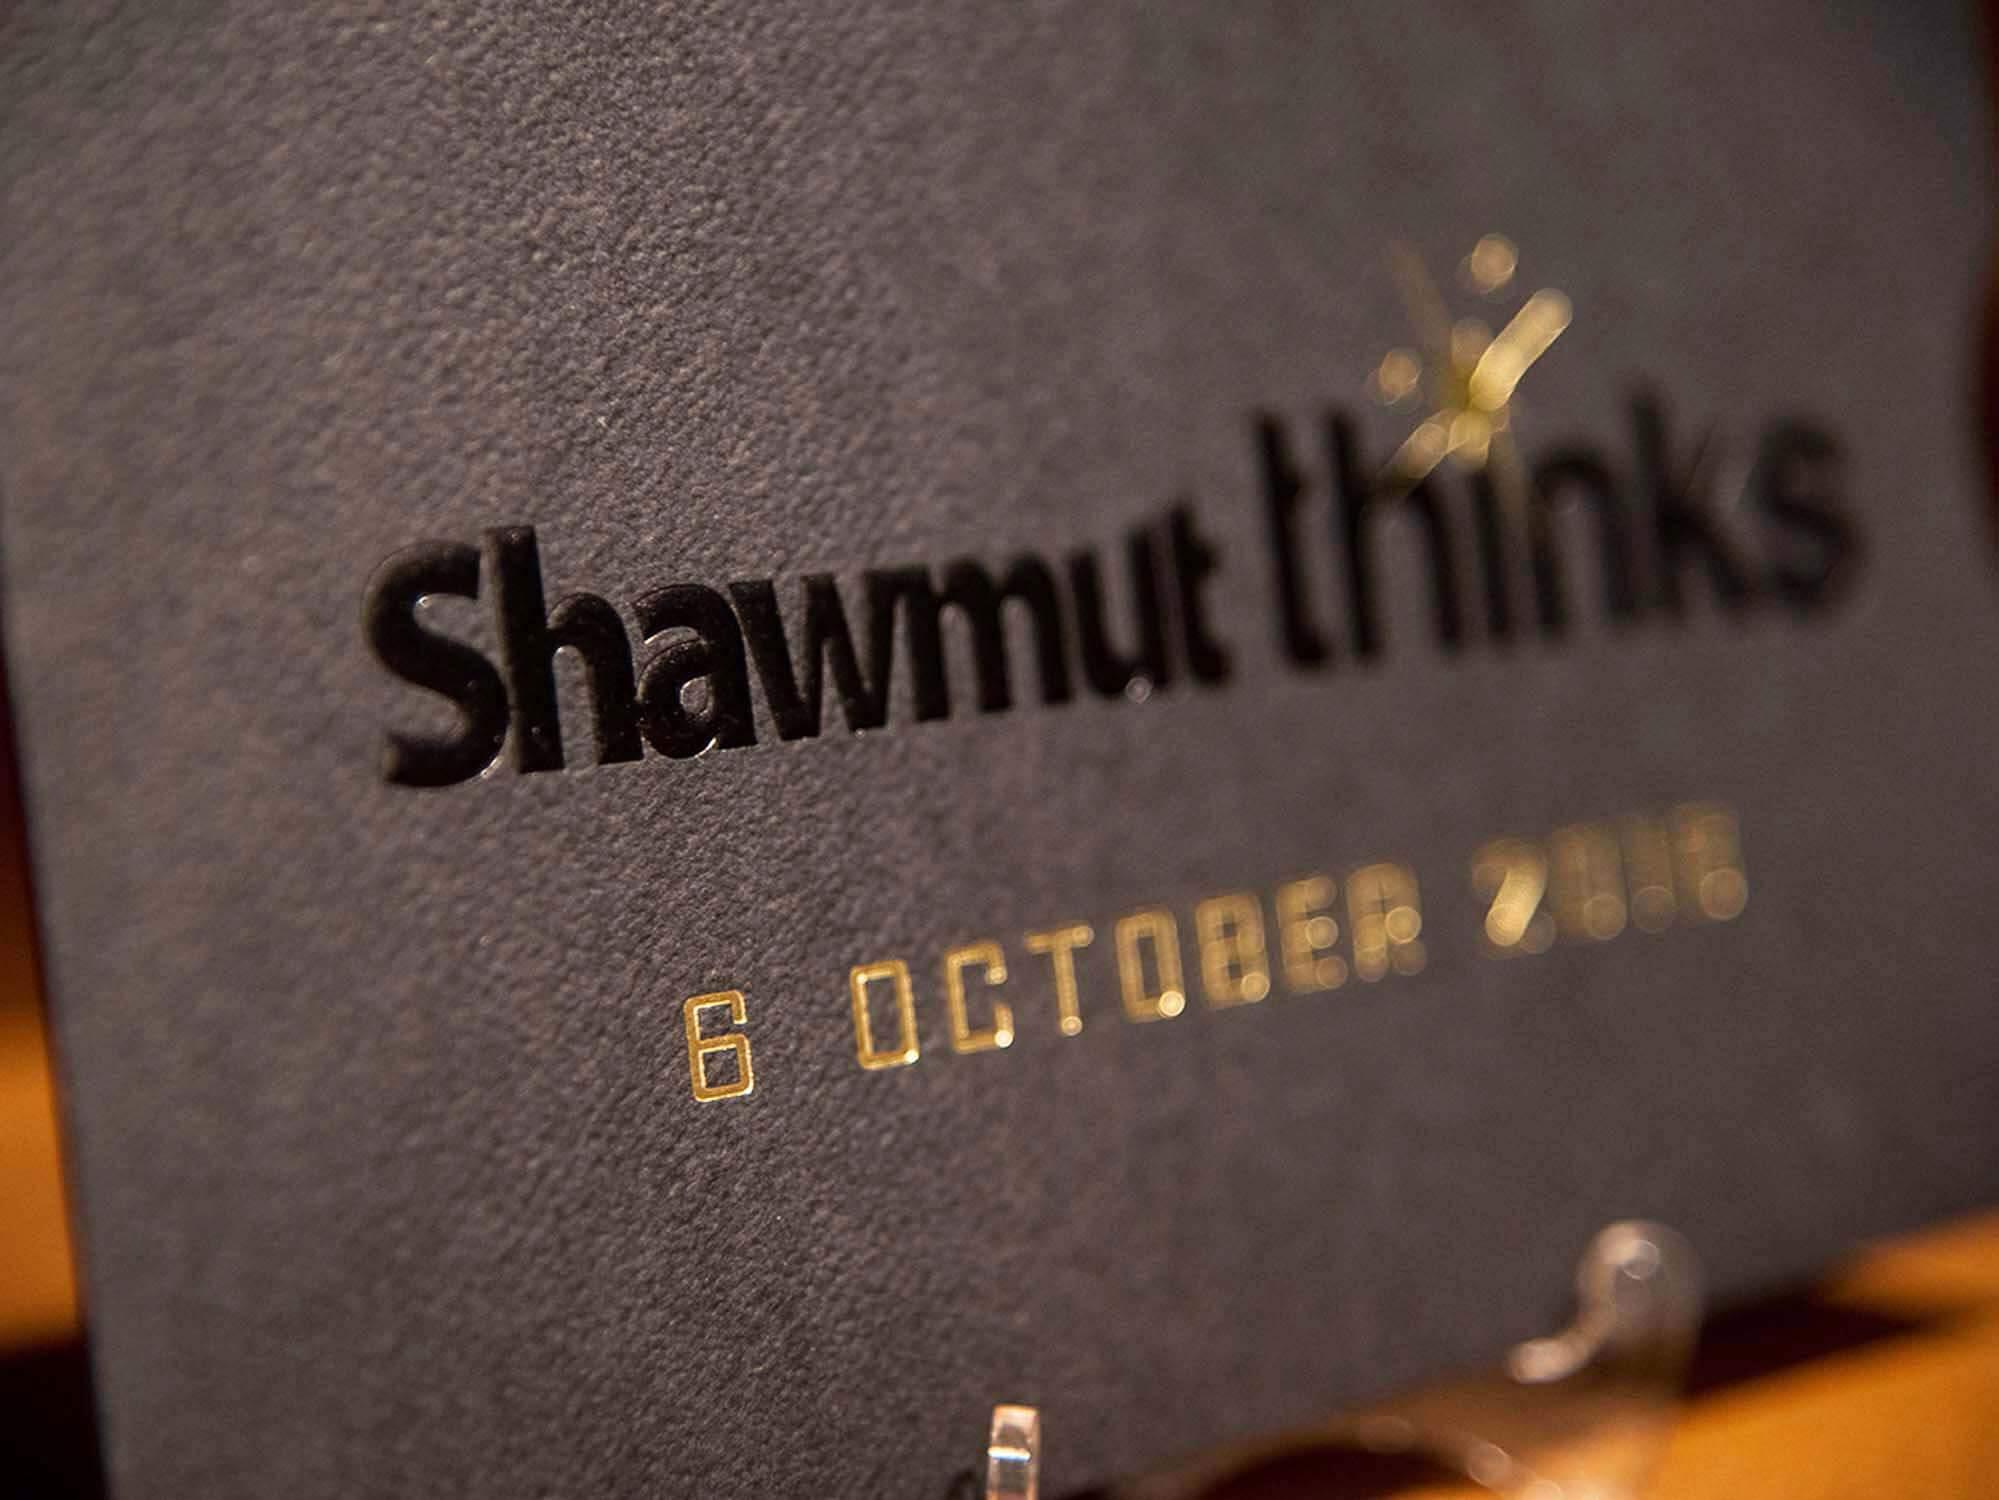 shawmut thinks event invitation